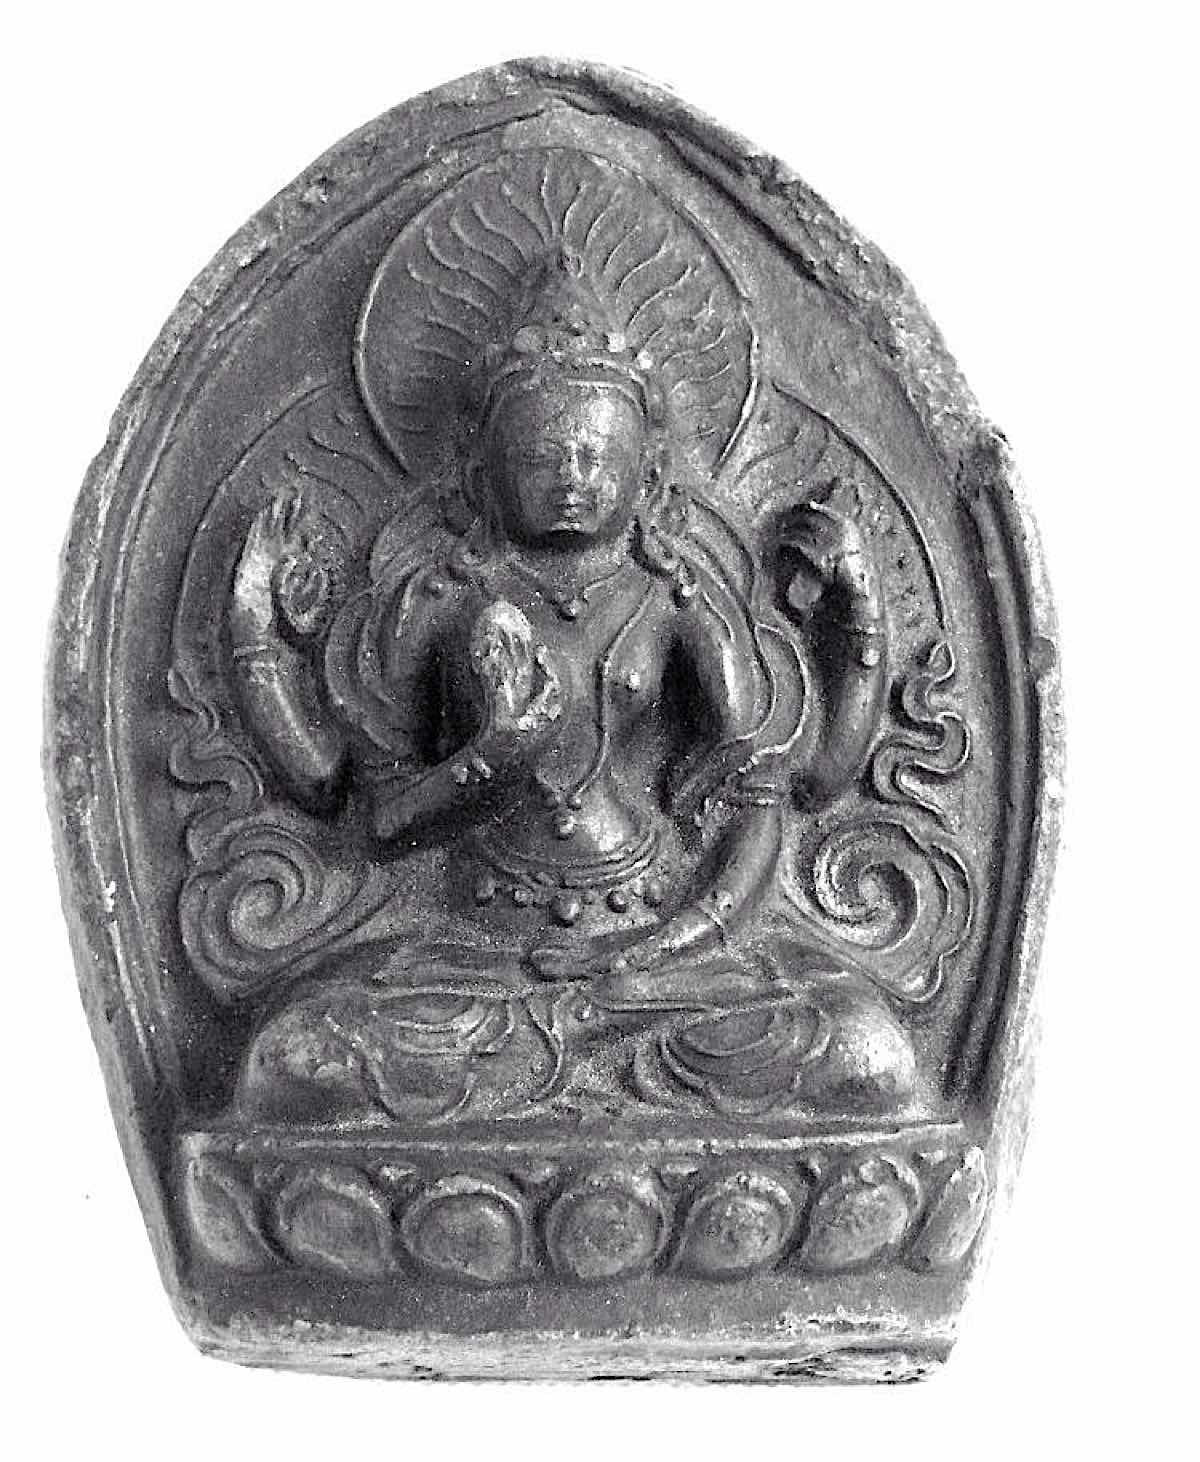 Buddha Weekly Prajnaparamita 4 hands golden Himalayan Art Resources Buddhism